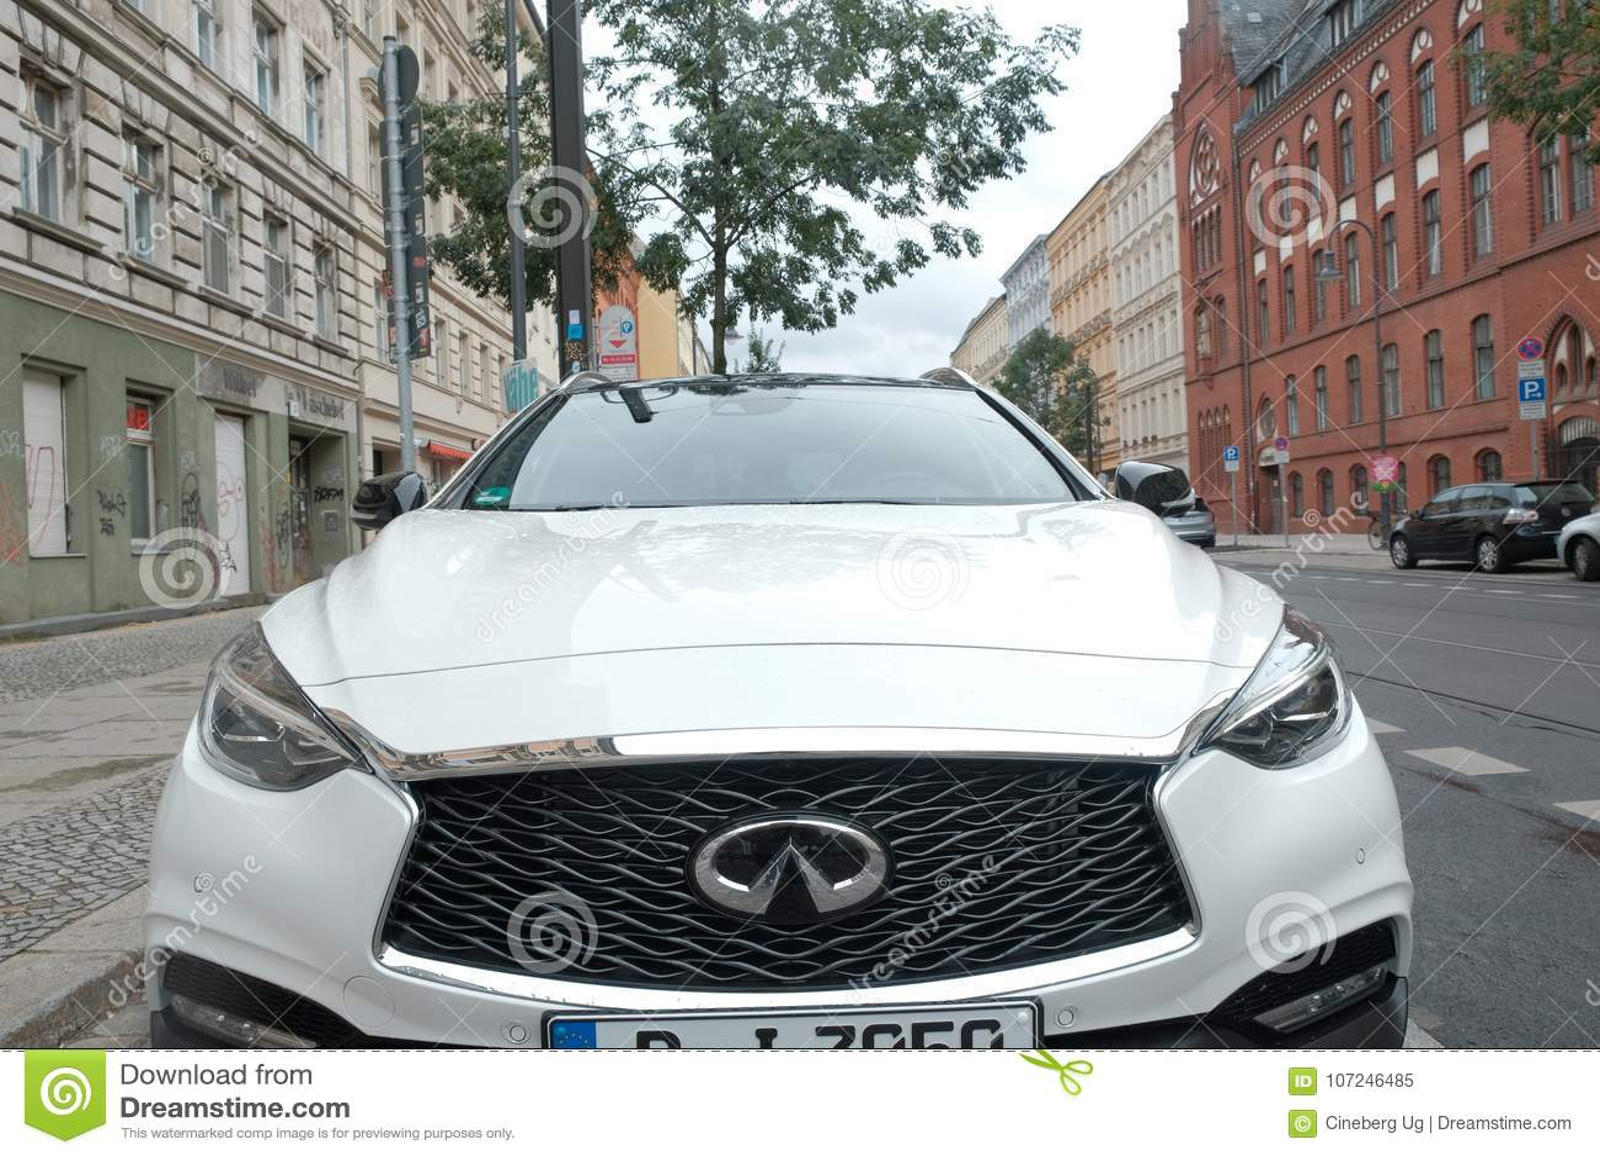 Nissan Infiniti White Car Editorial Image Image Of Brand 107246485